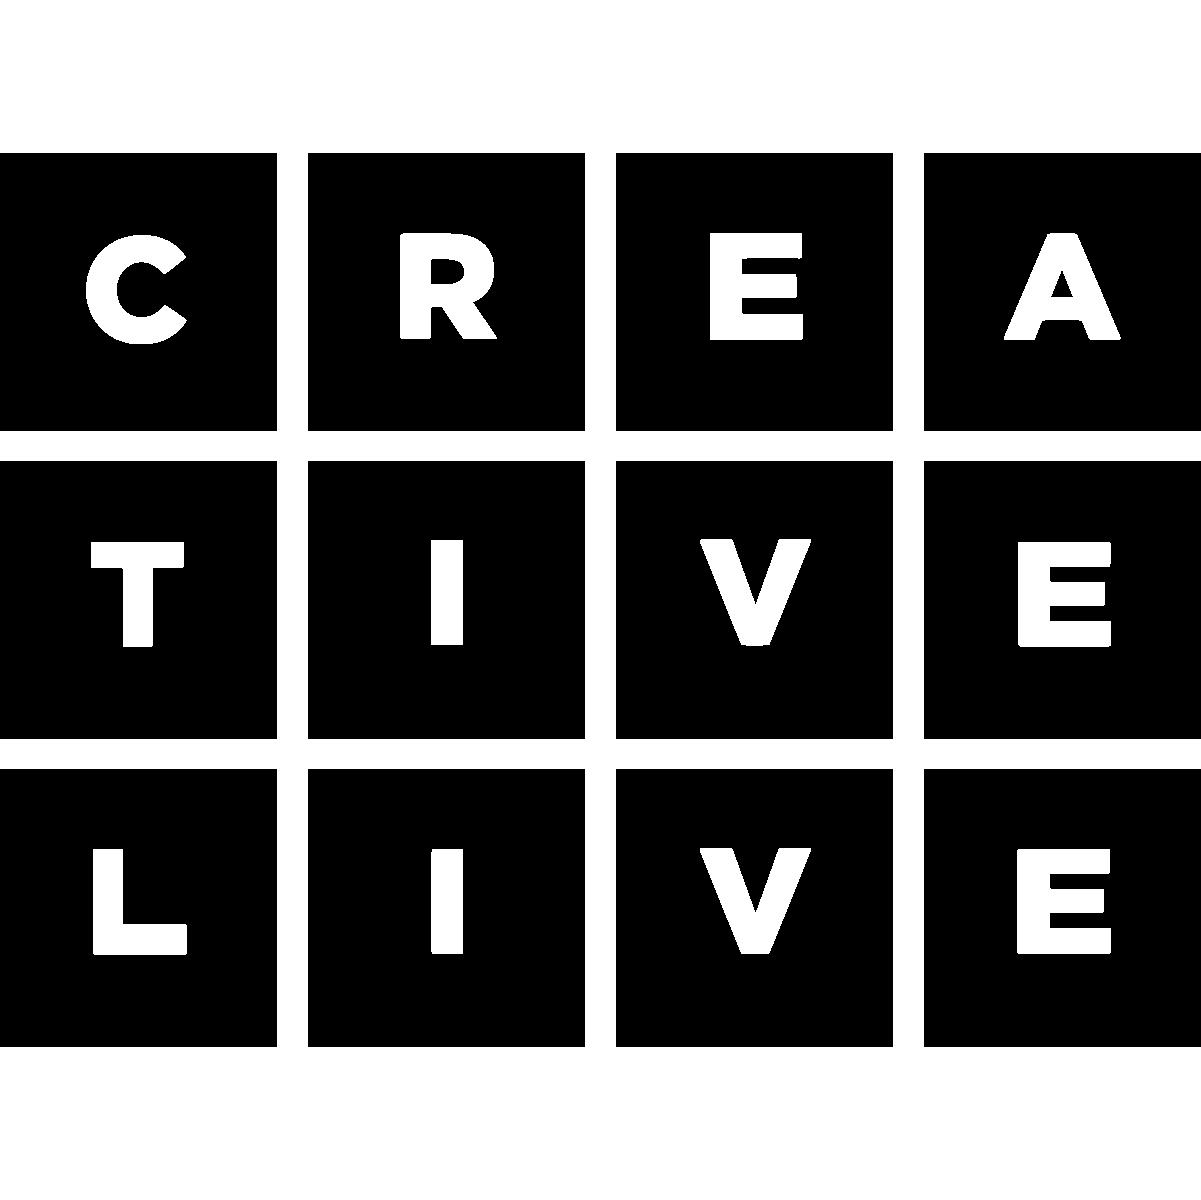 staciewebsite-logo_CreativeLive.png